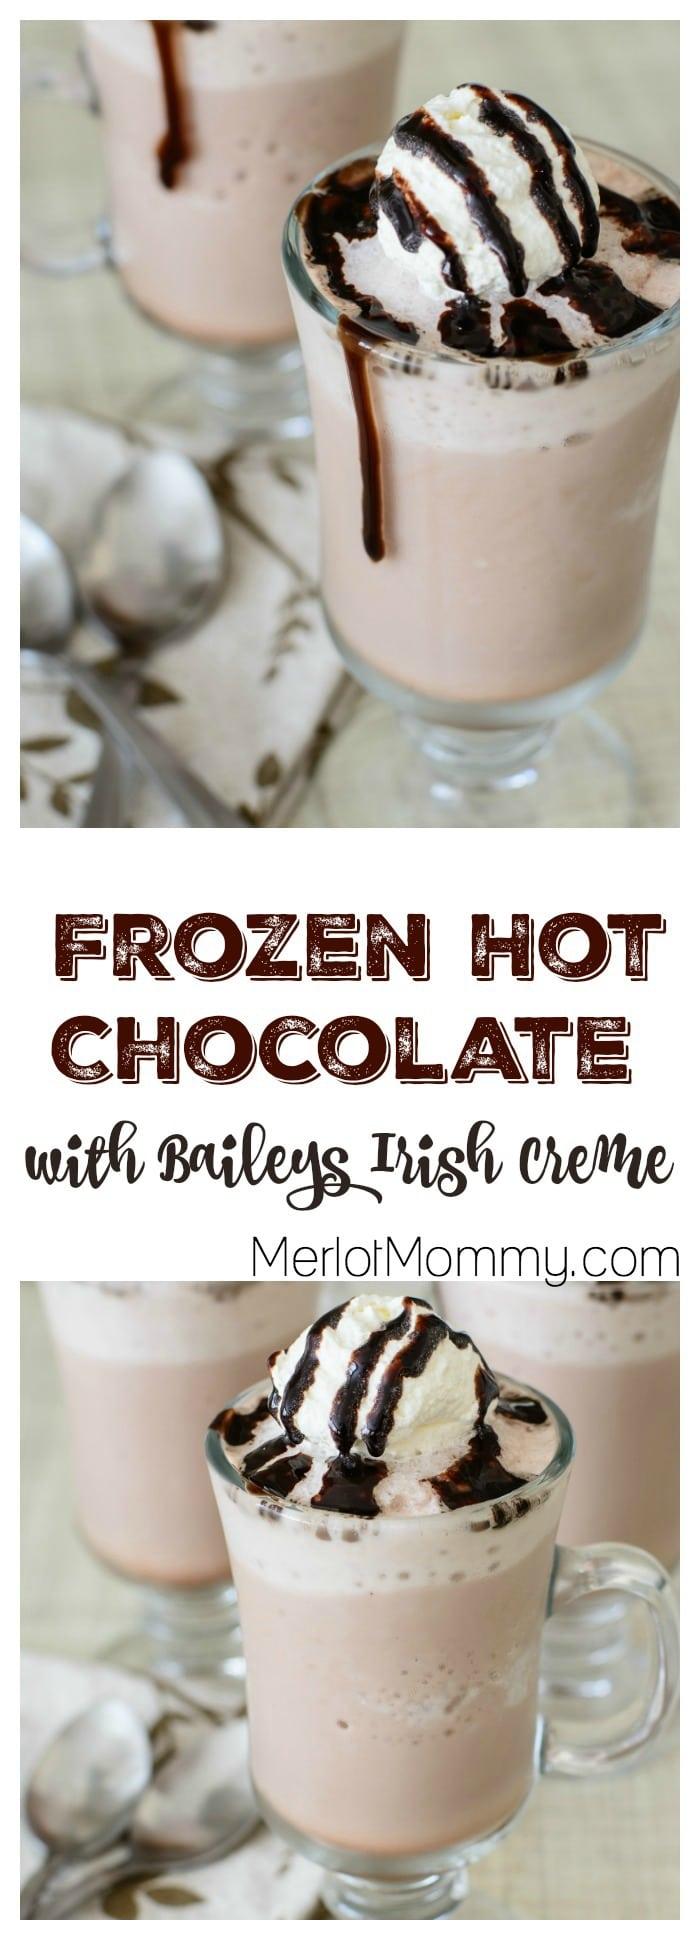 Game of Thrones-Inspired Frozen Hot Chocolate with Baileys Irish Creme